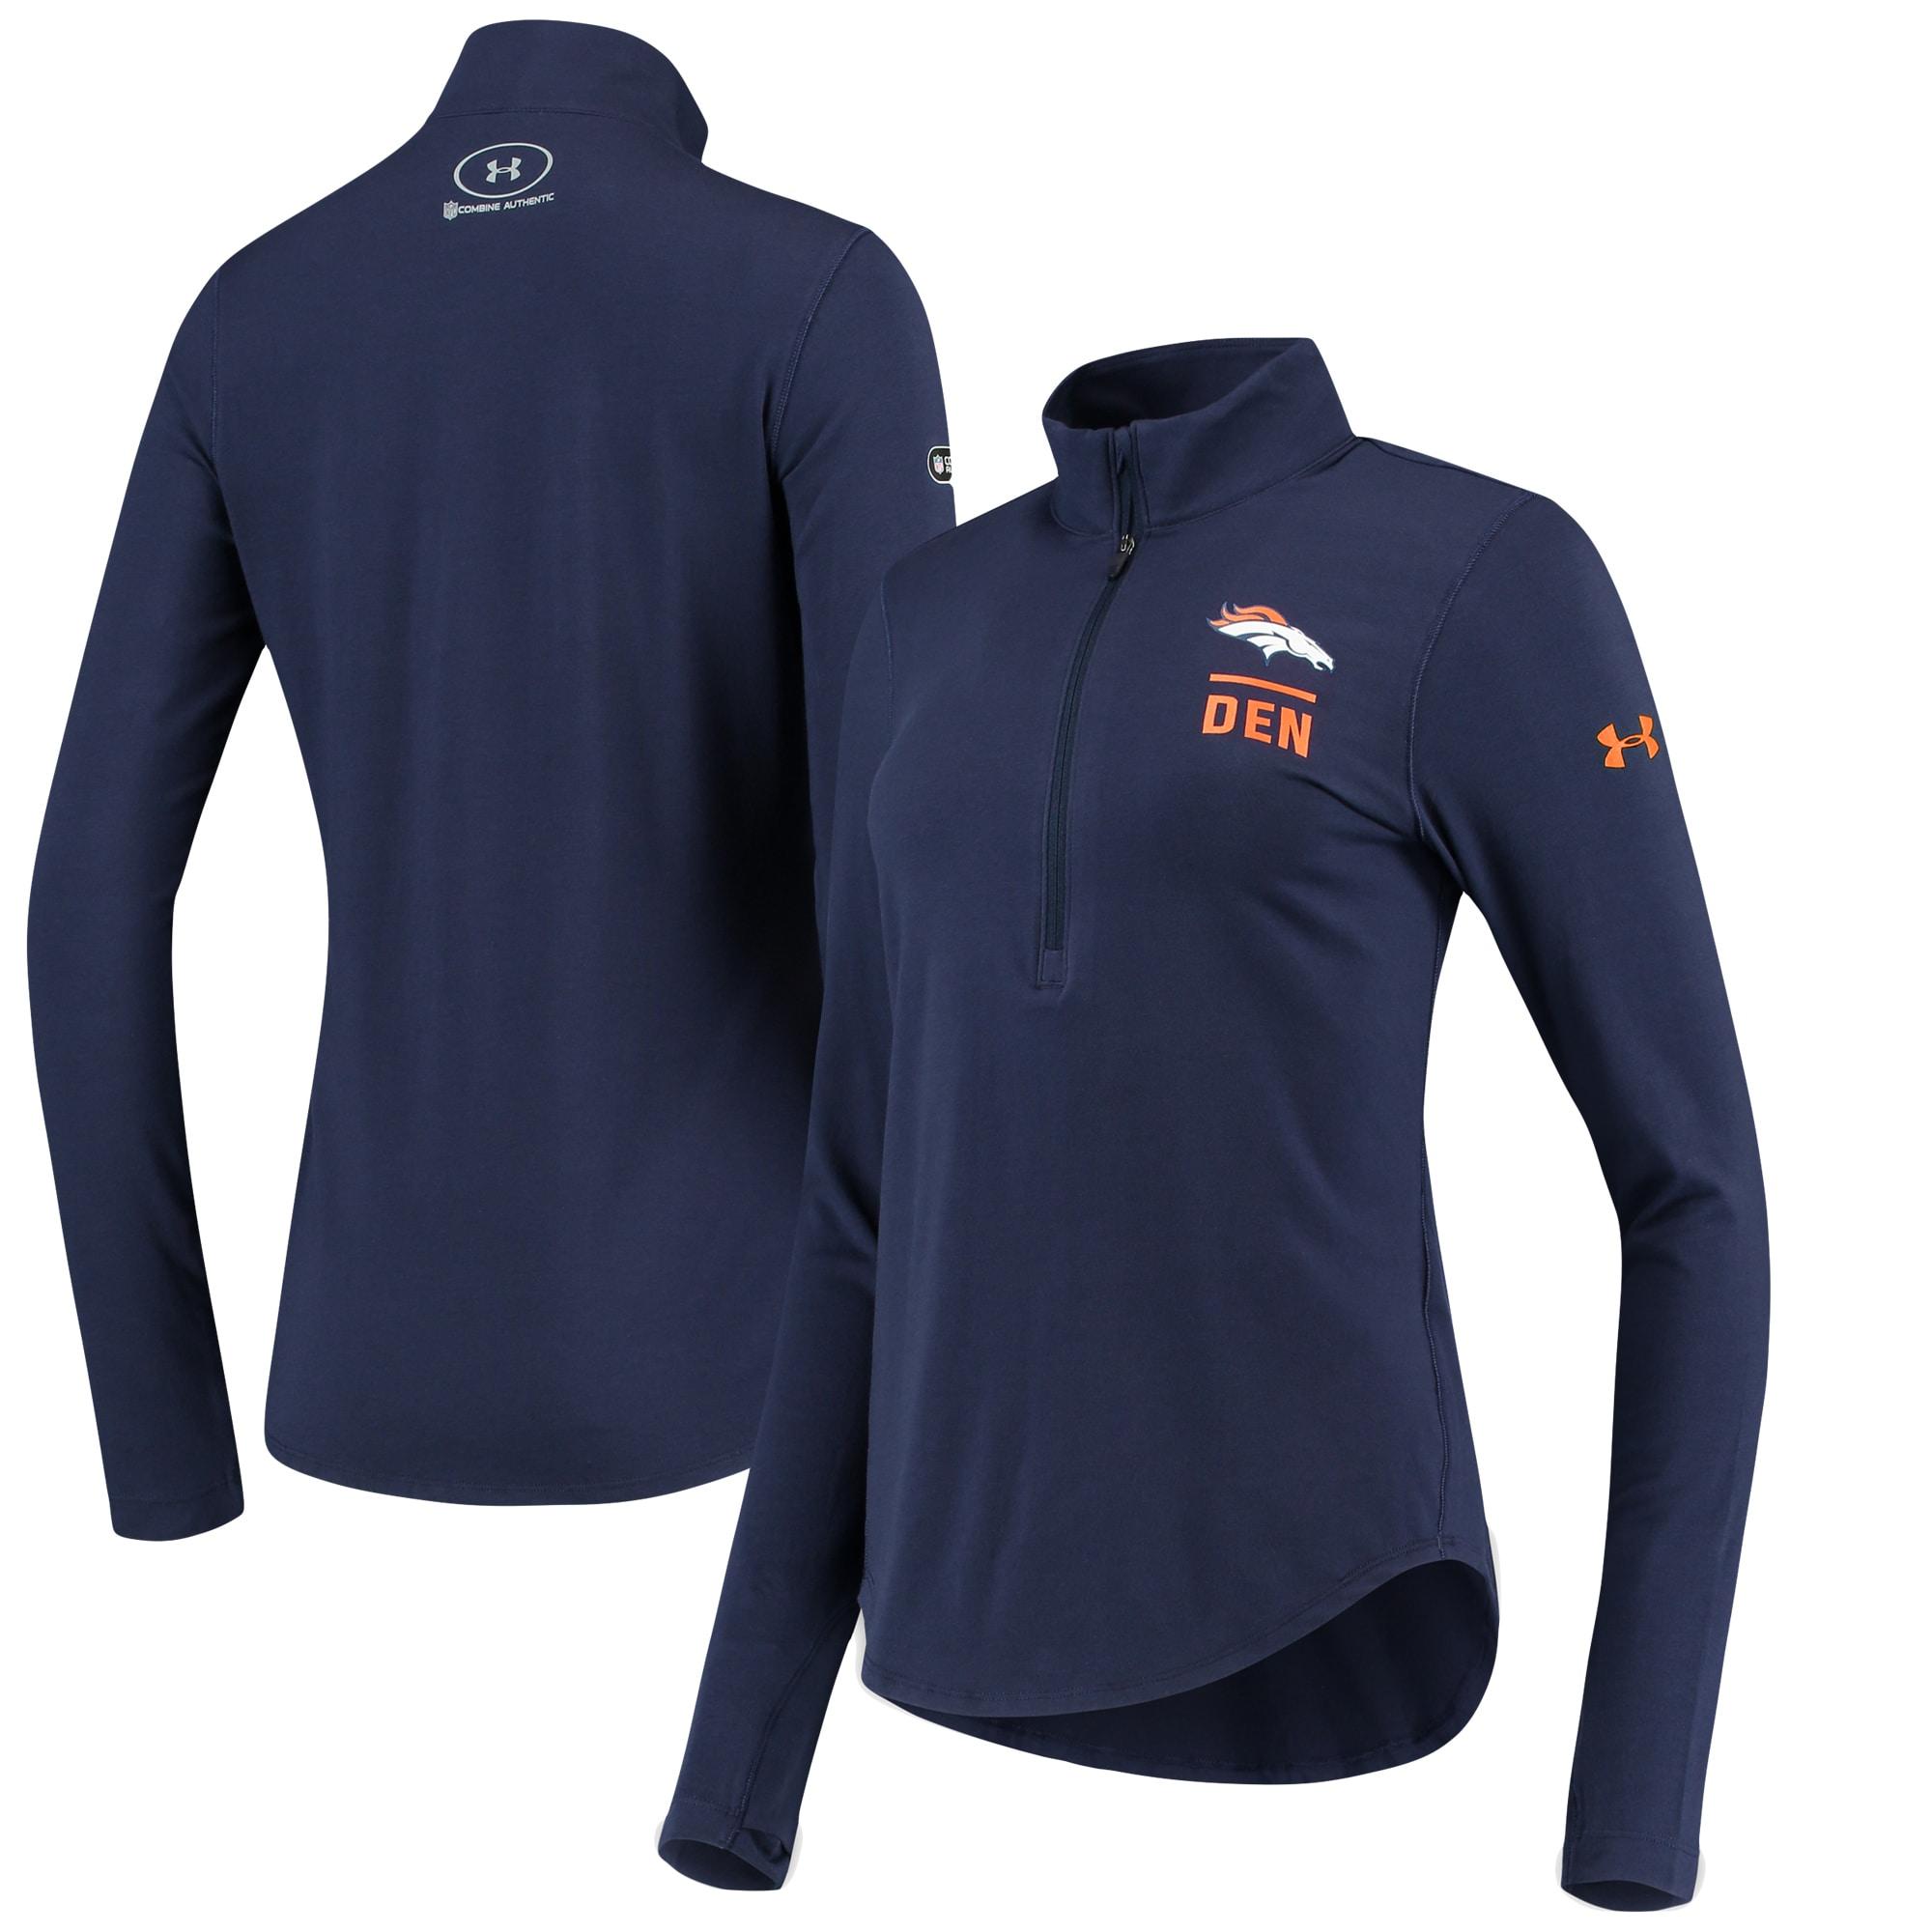 Denver Broncos Under Armour Women's Combine Authentic Favorites Performance Tri-Blend Half-Zip Pullover Jacket - Navy